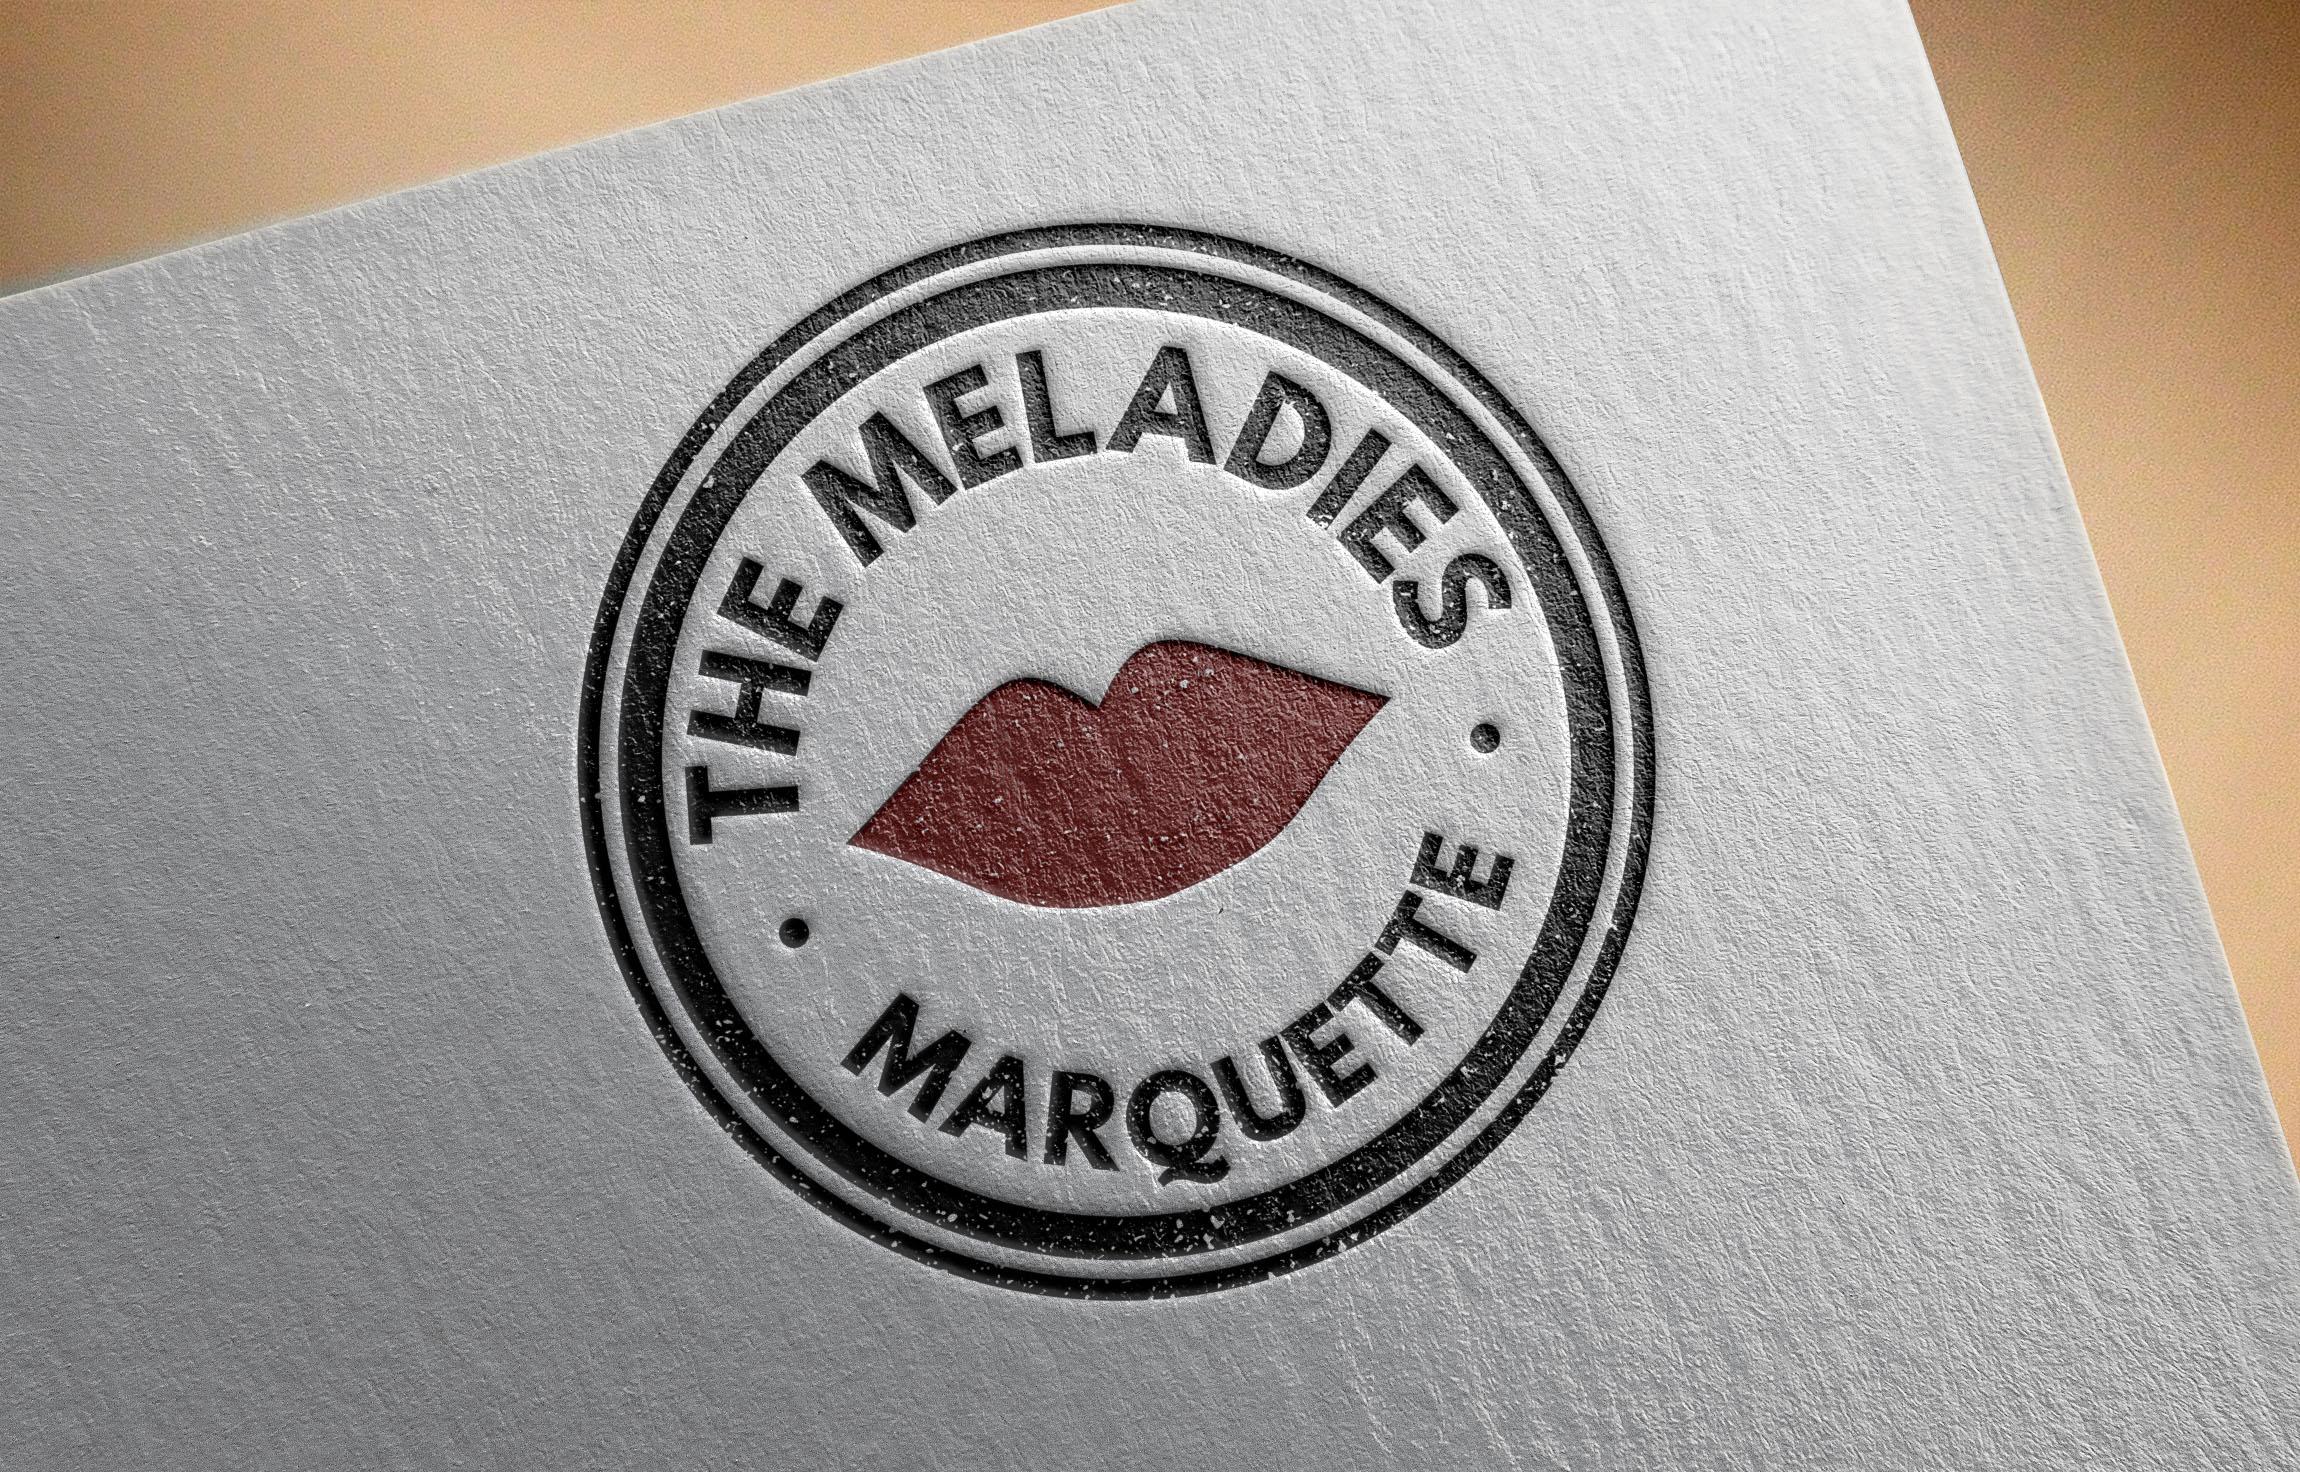 Meladies logo